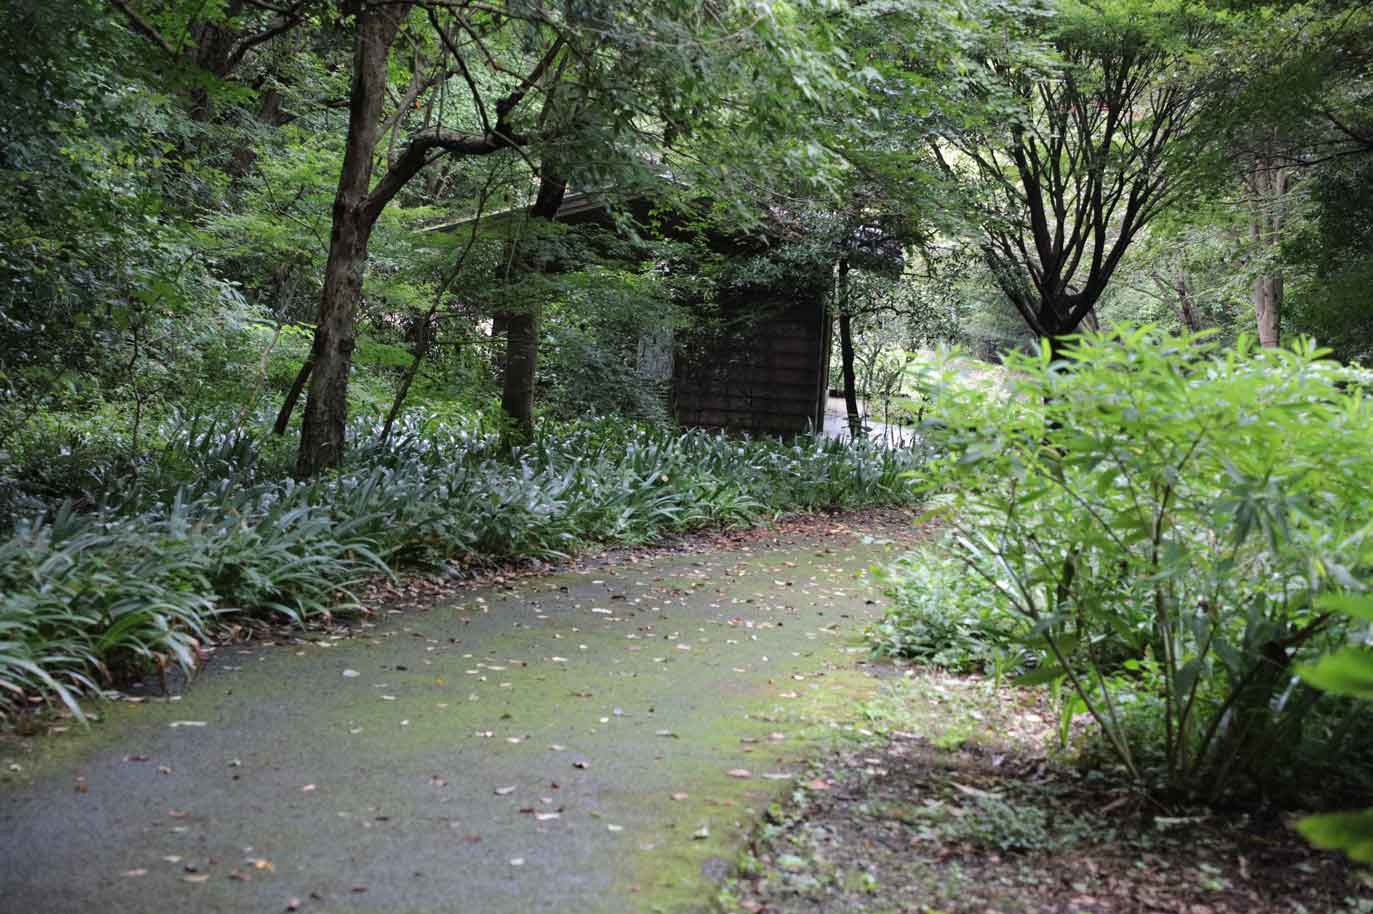 鎌倉中央公園の遊歩道